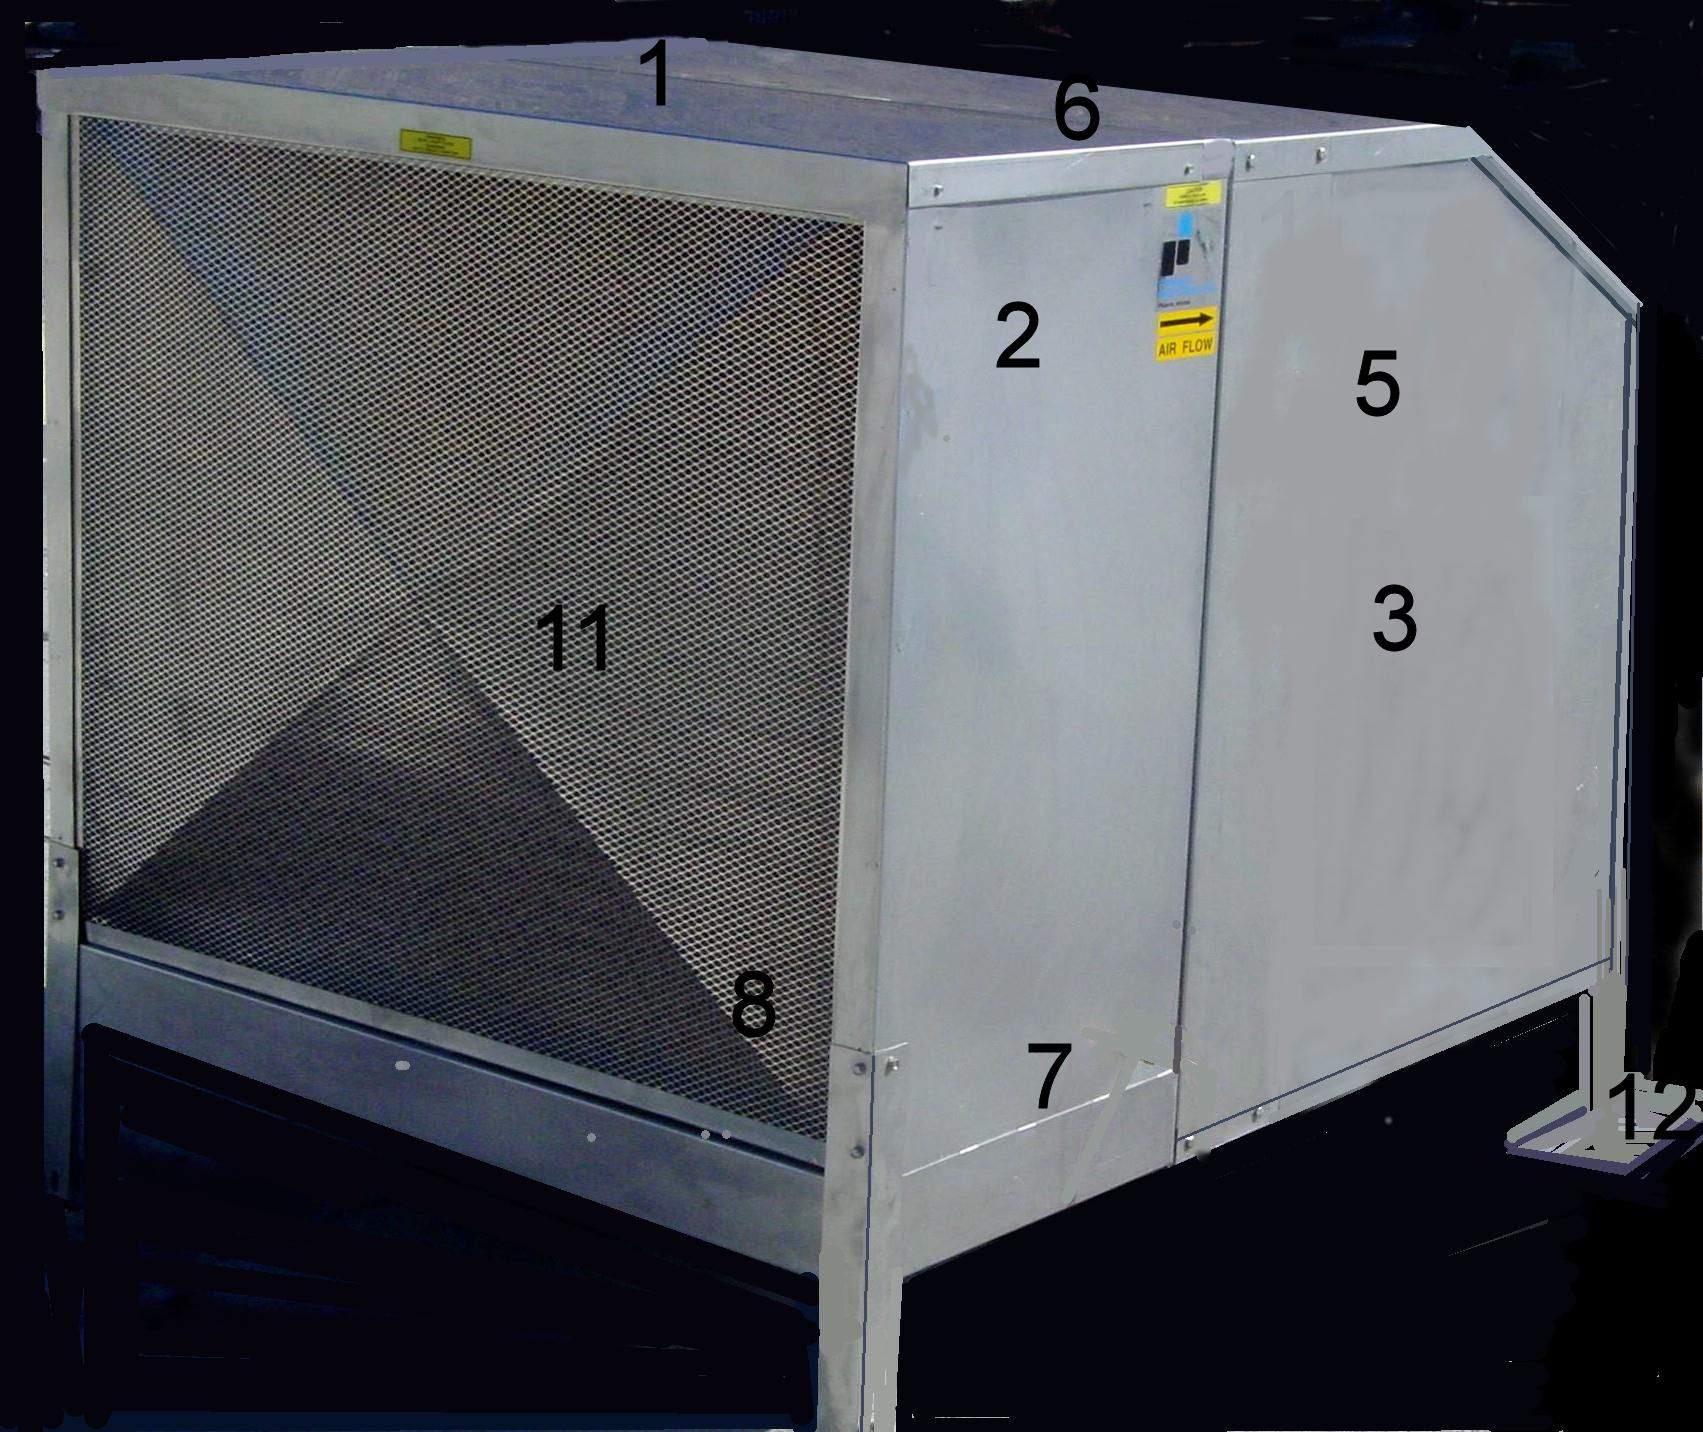 Phoenix Evap Cooler : Residential evaporative coolers in phoenix arizona